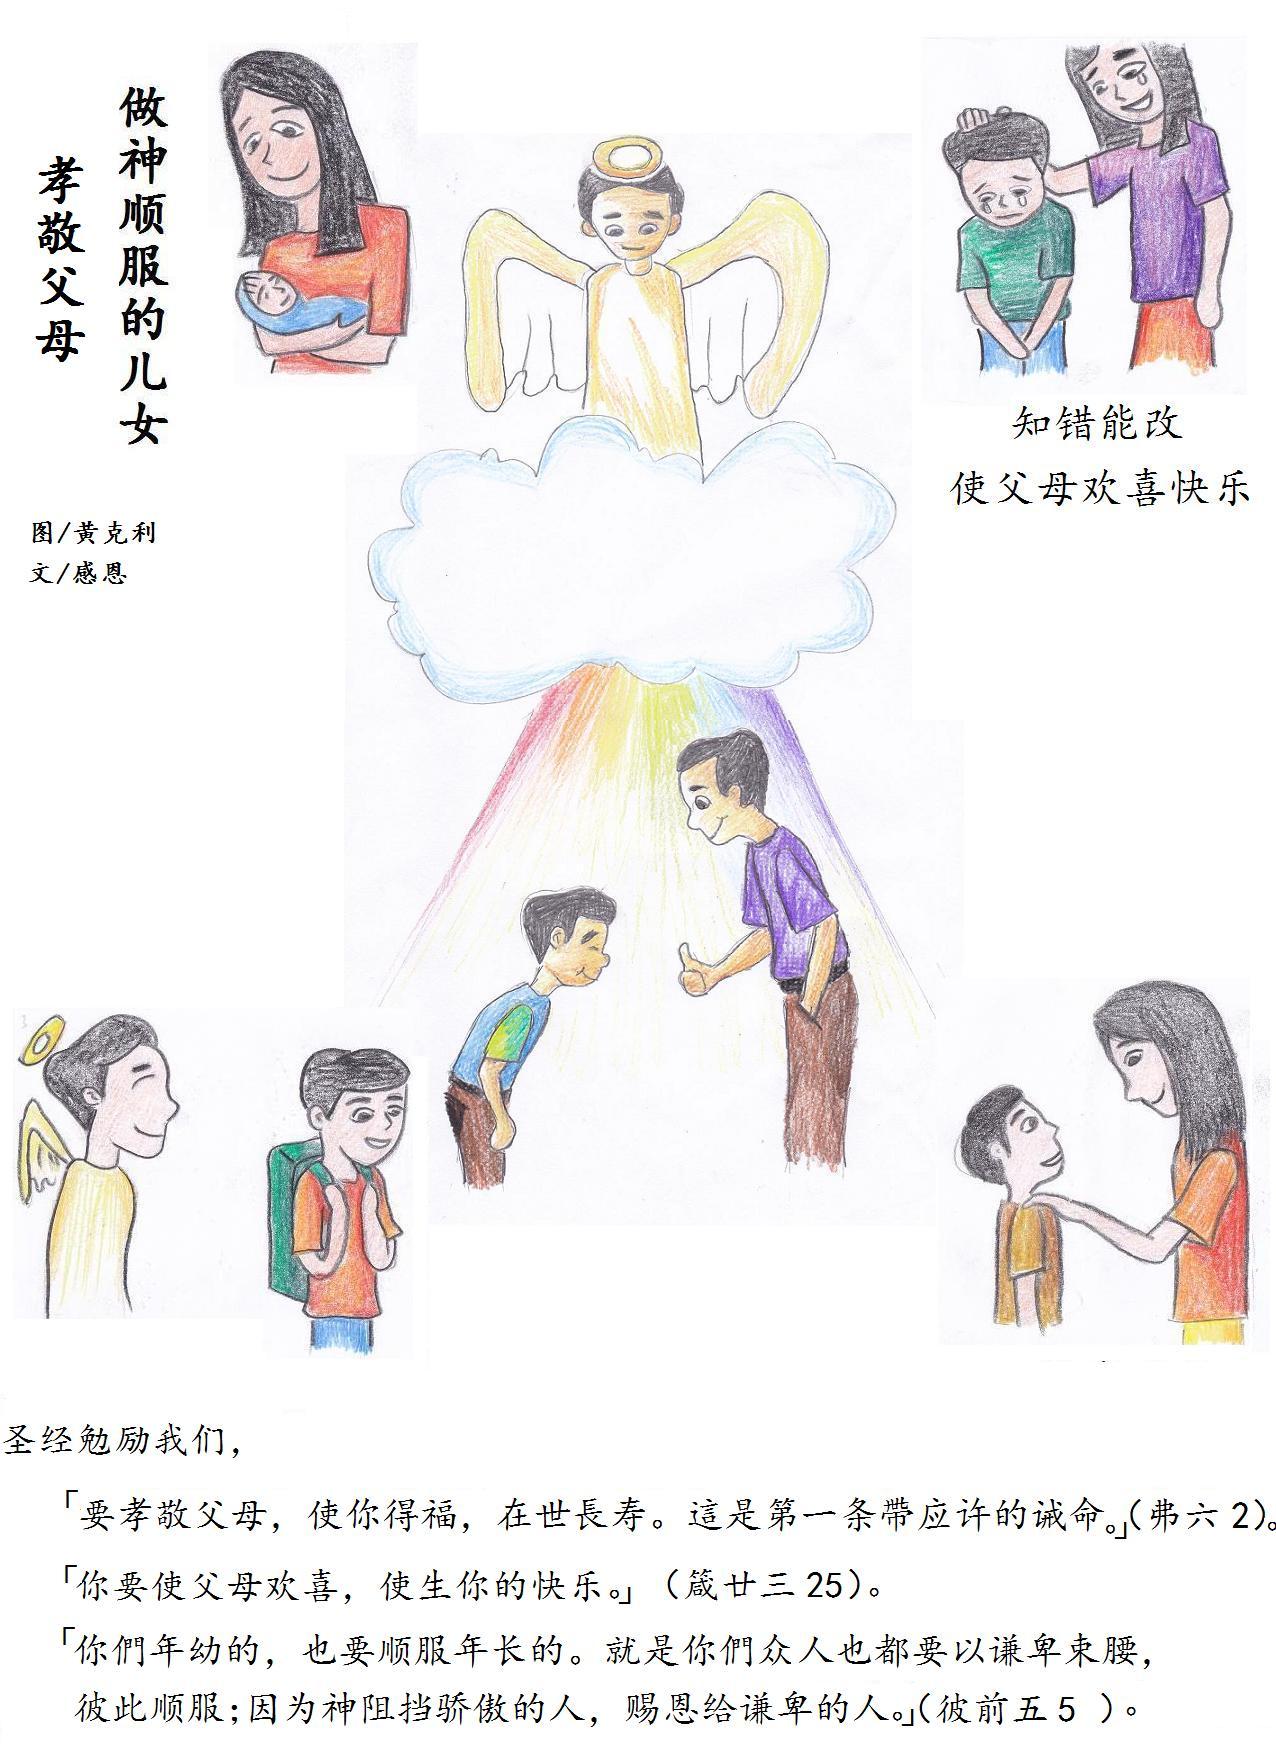 14 漫画  孝敬父母 Final